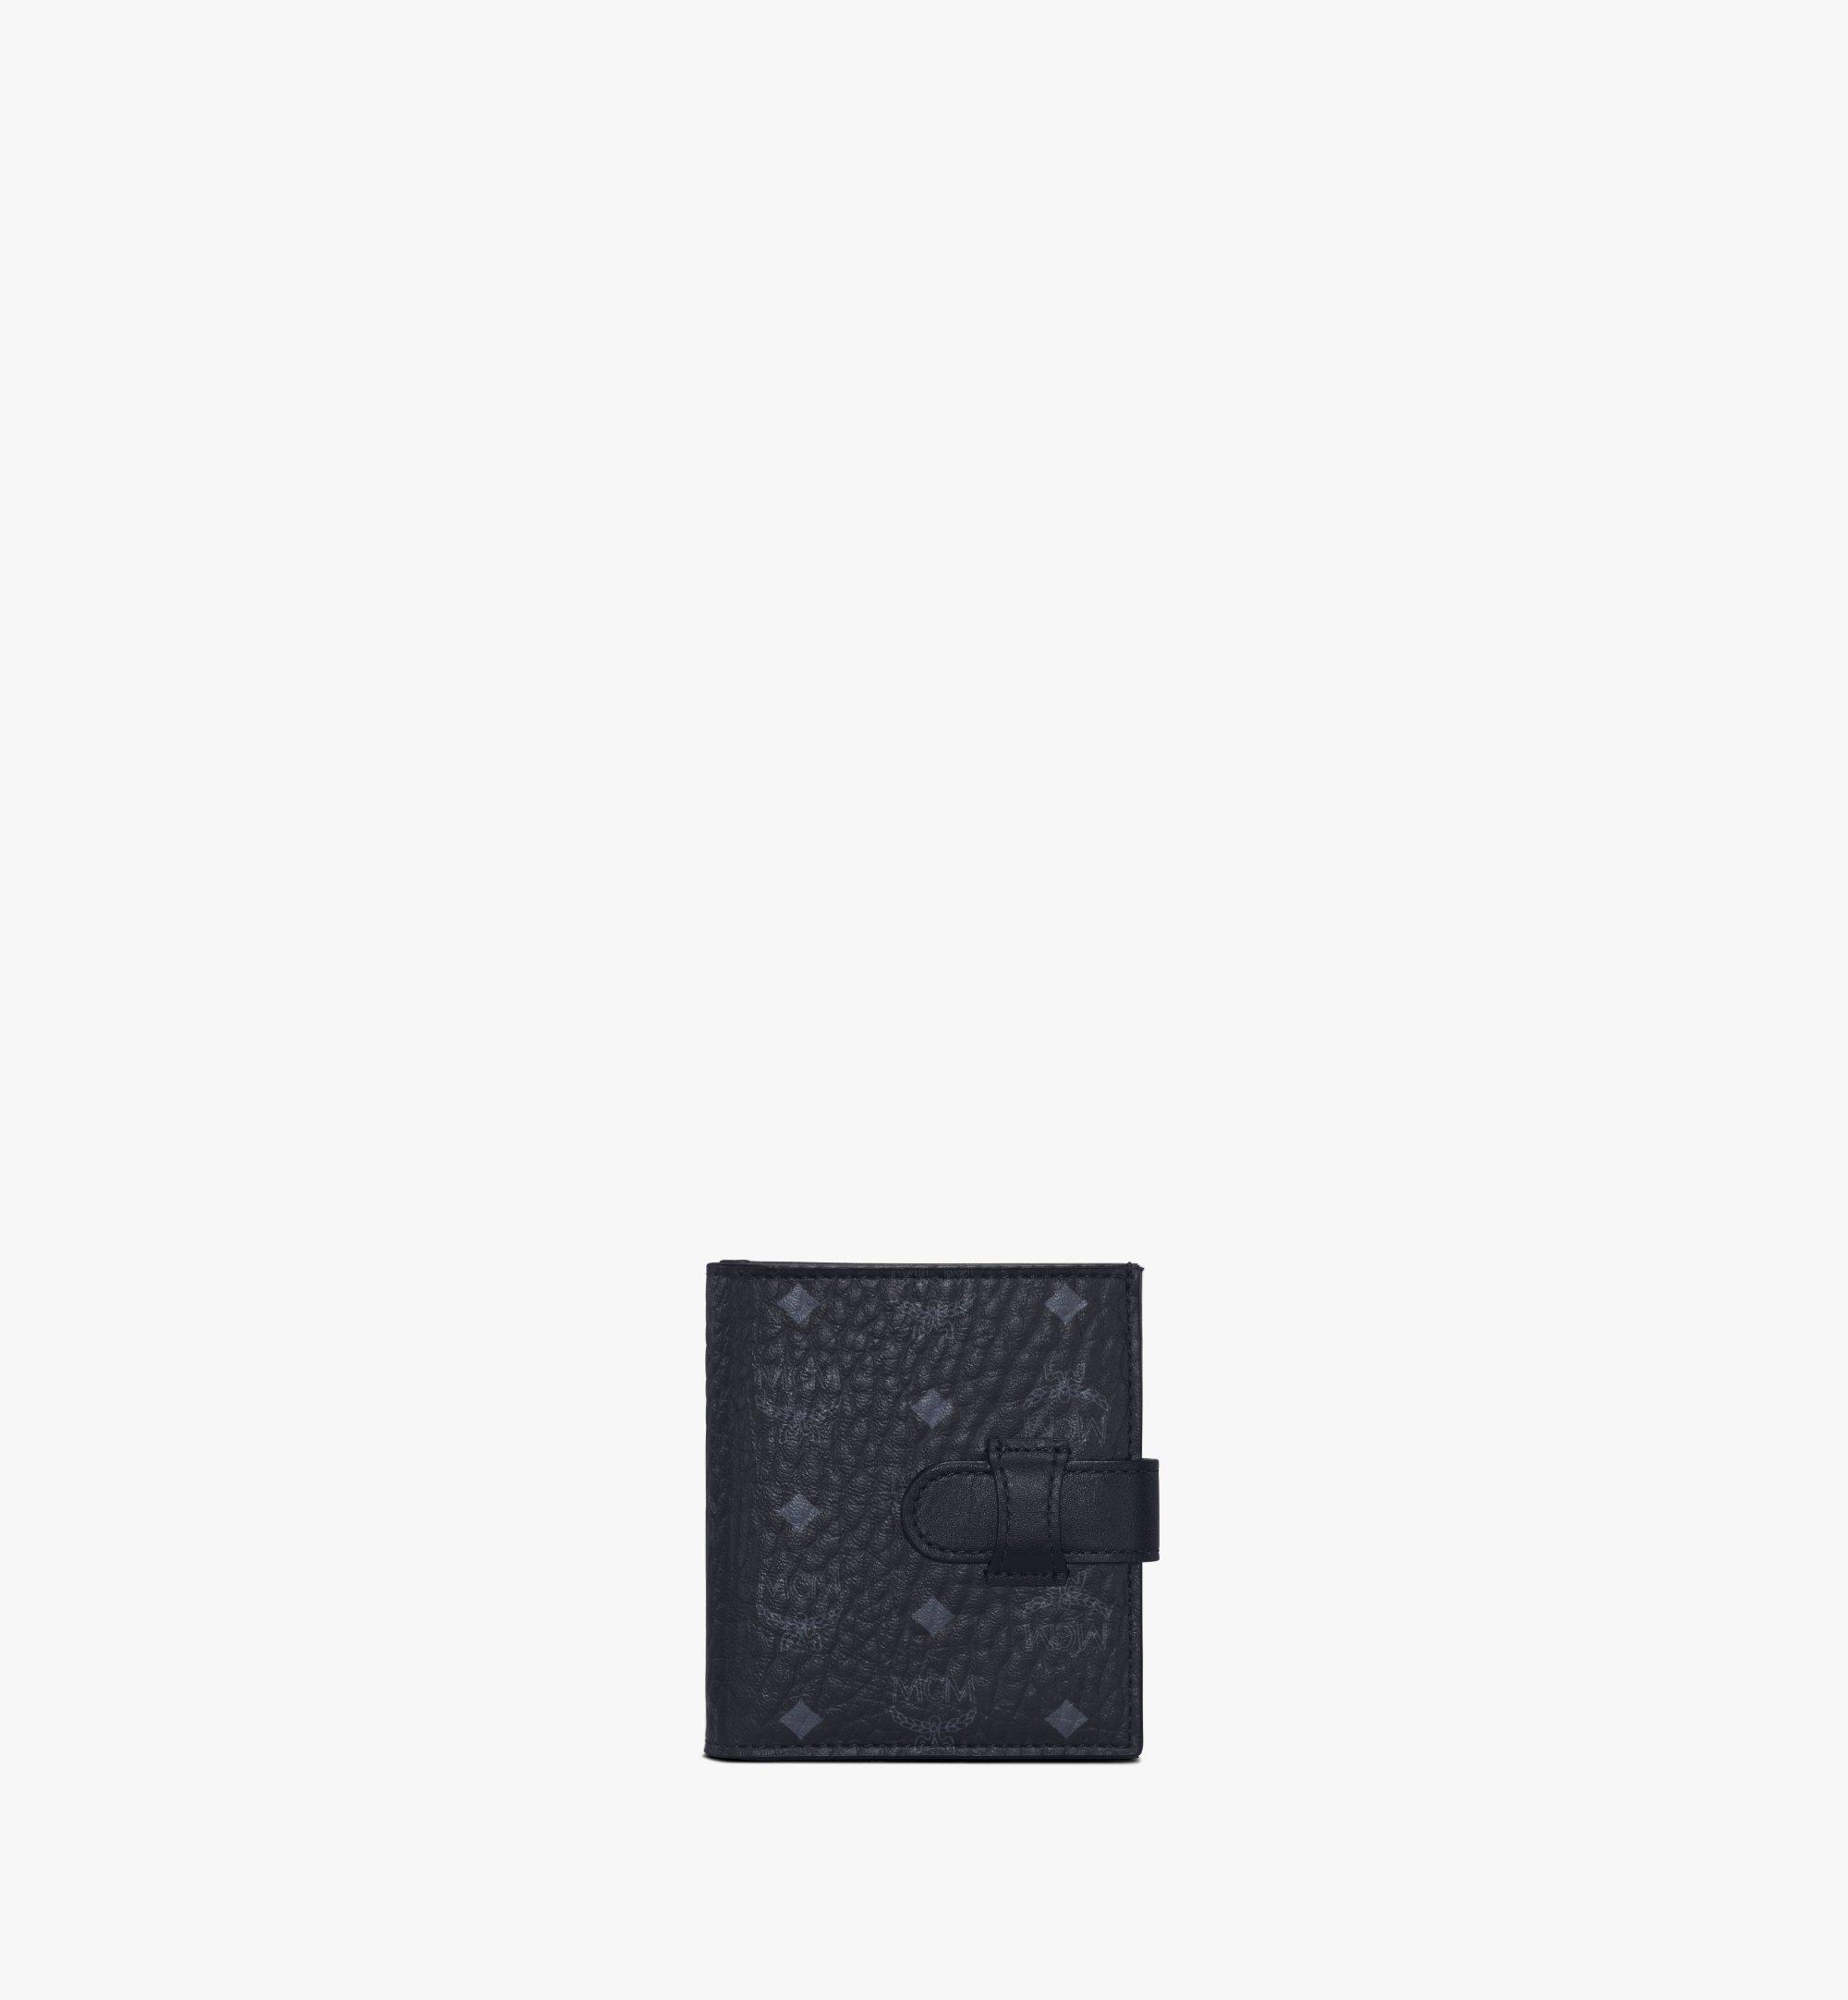 MCM Bifold Card Wallet in Visetos Original Black MXSAAVI05BK001 Alternate View 1